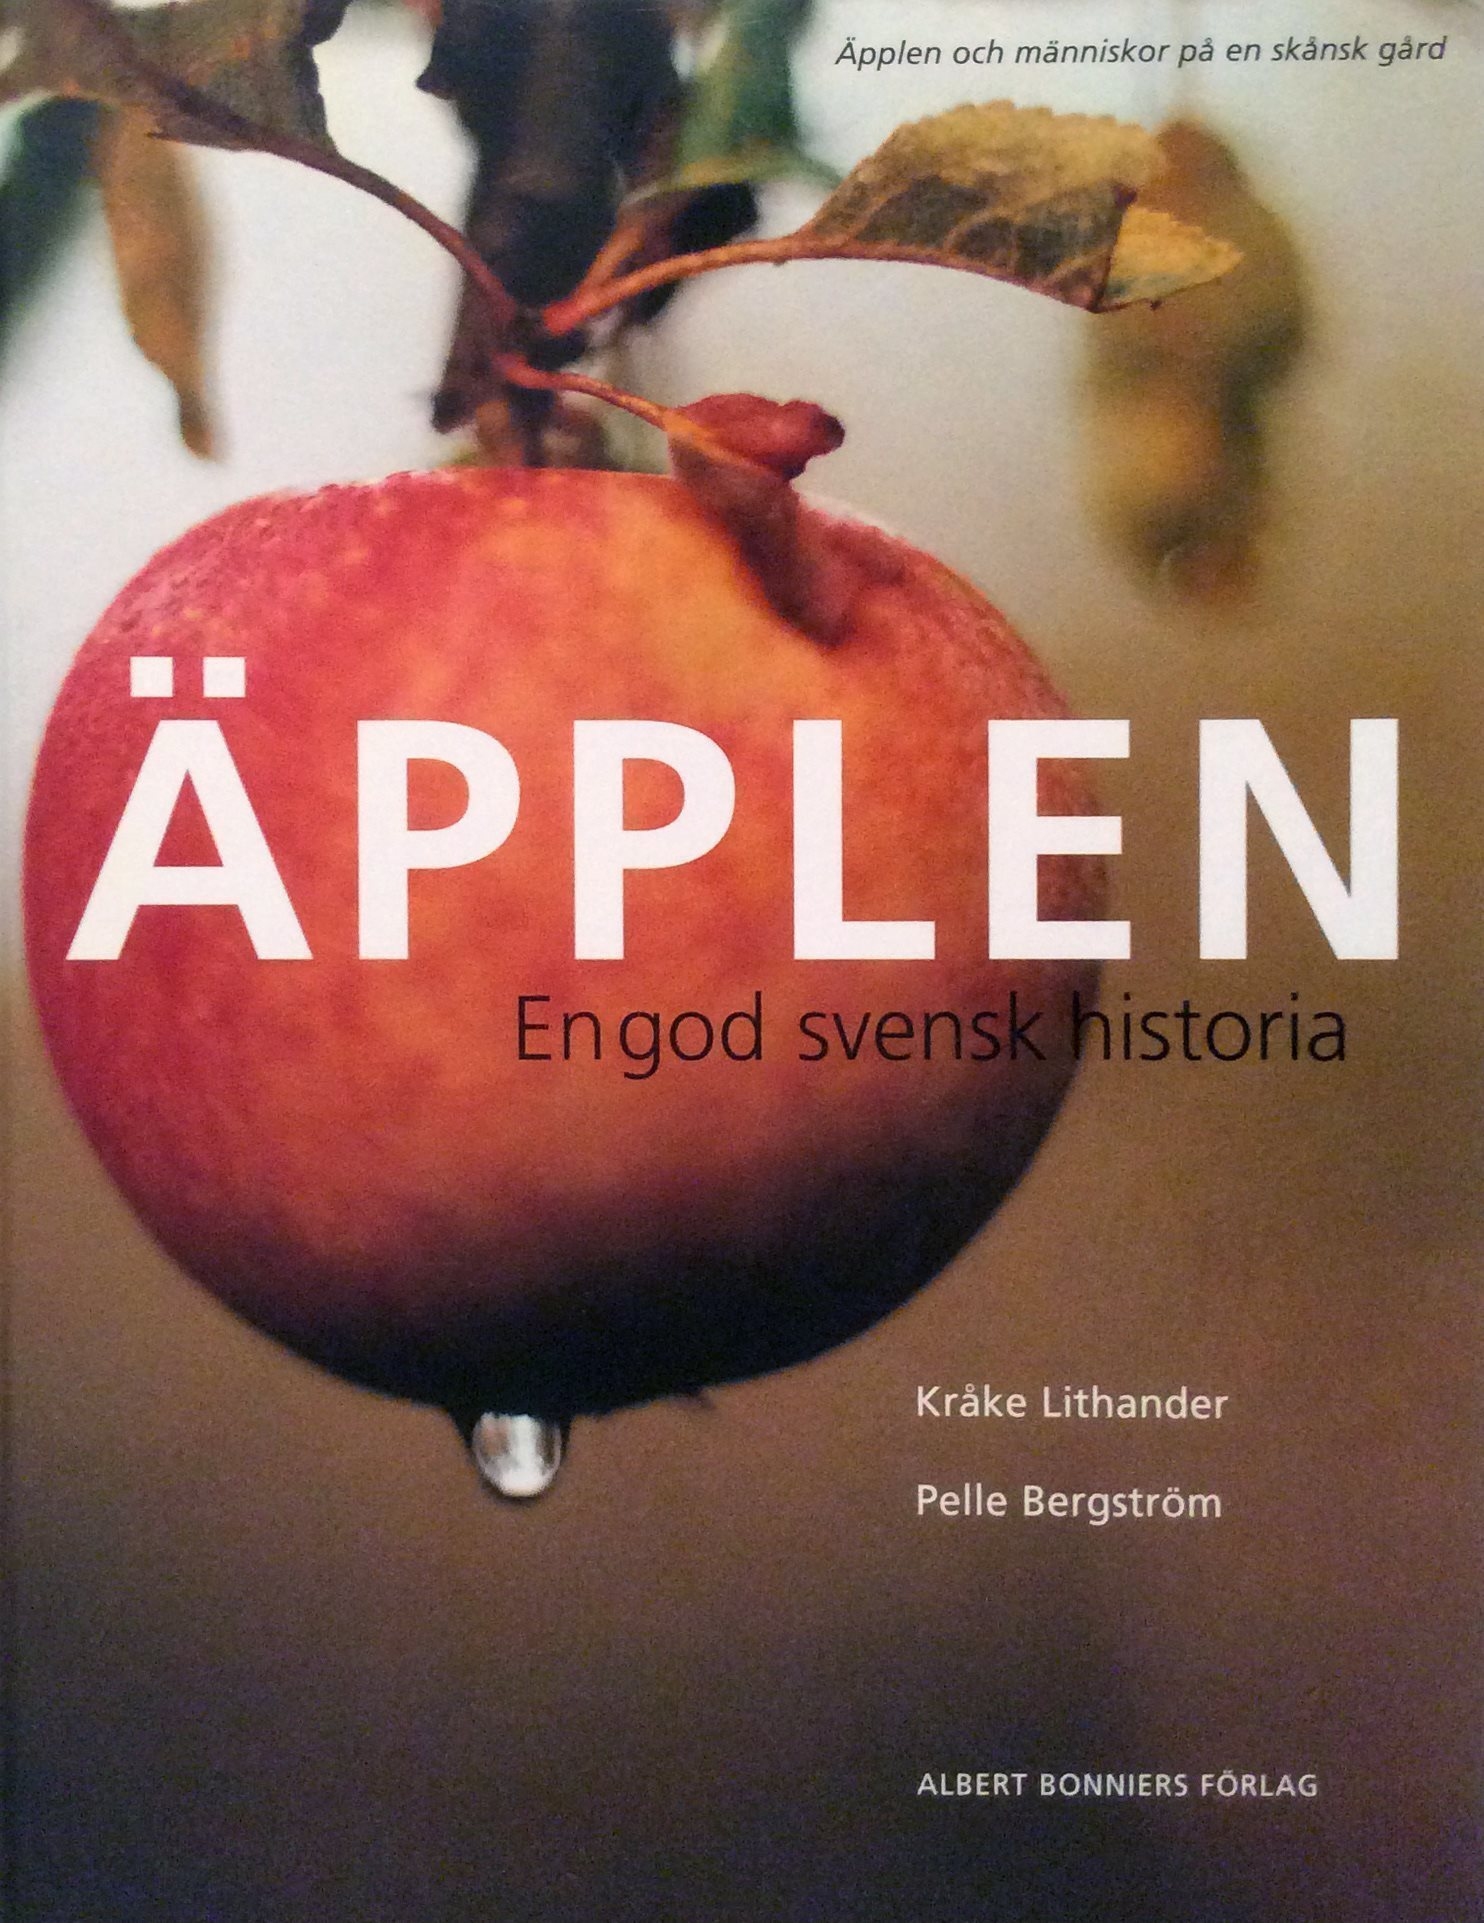 Äpplen - En god svensk historia Skåne!